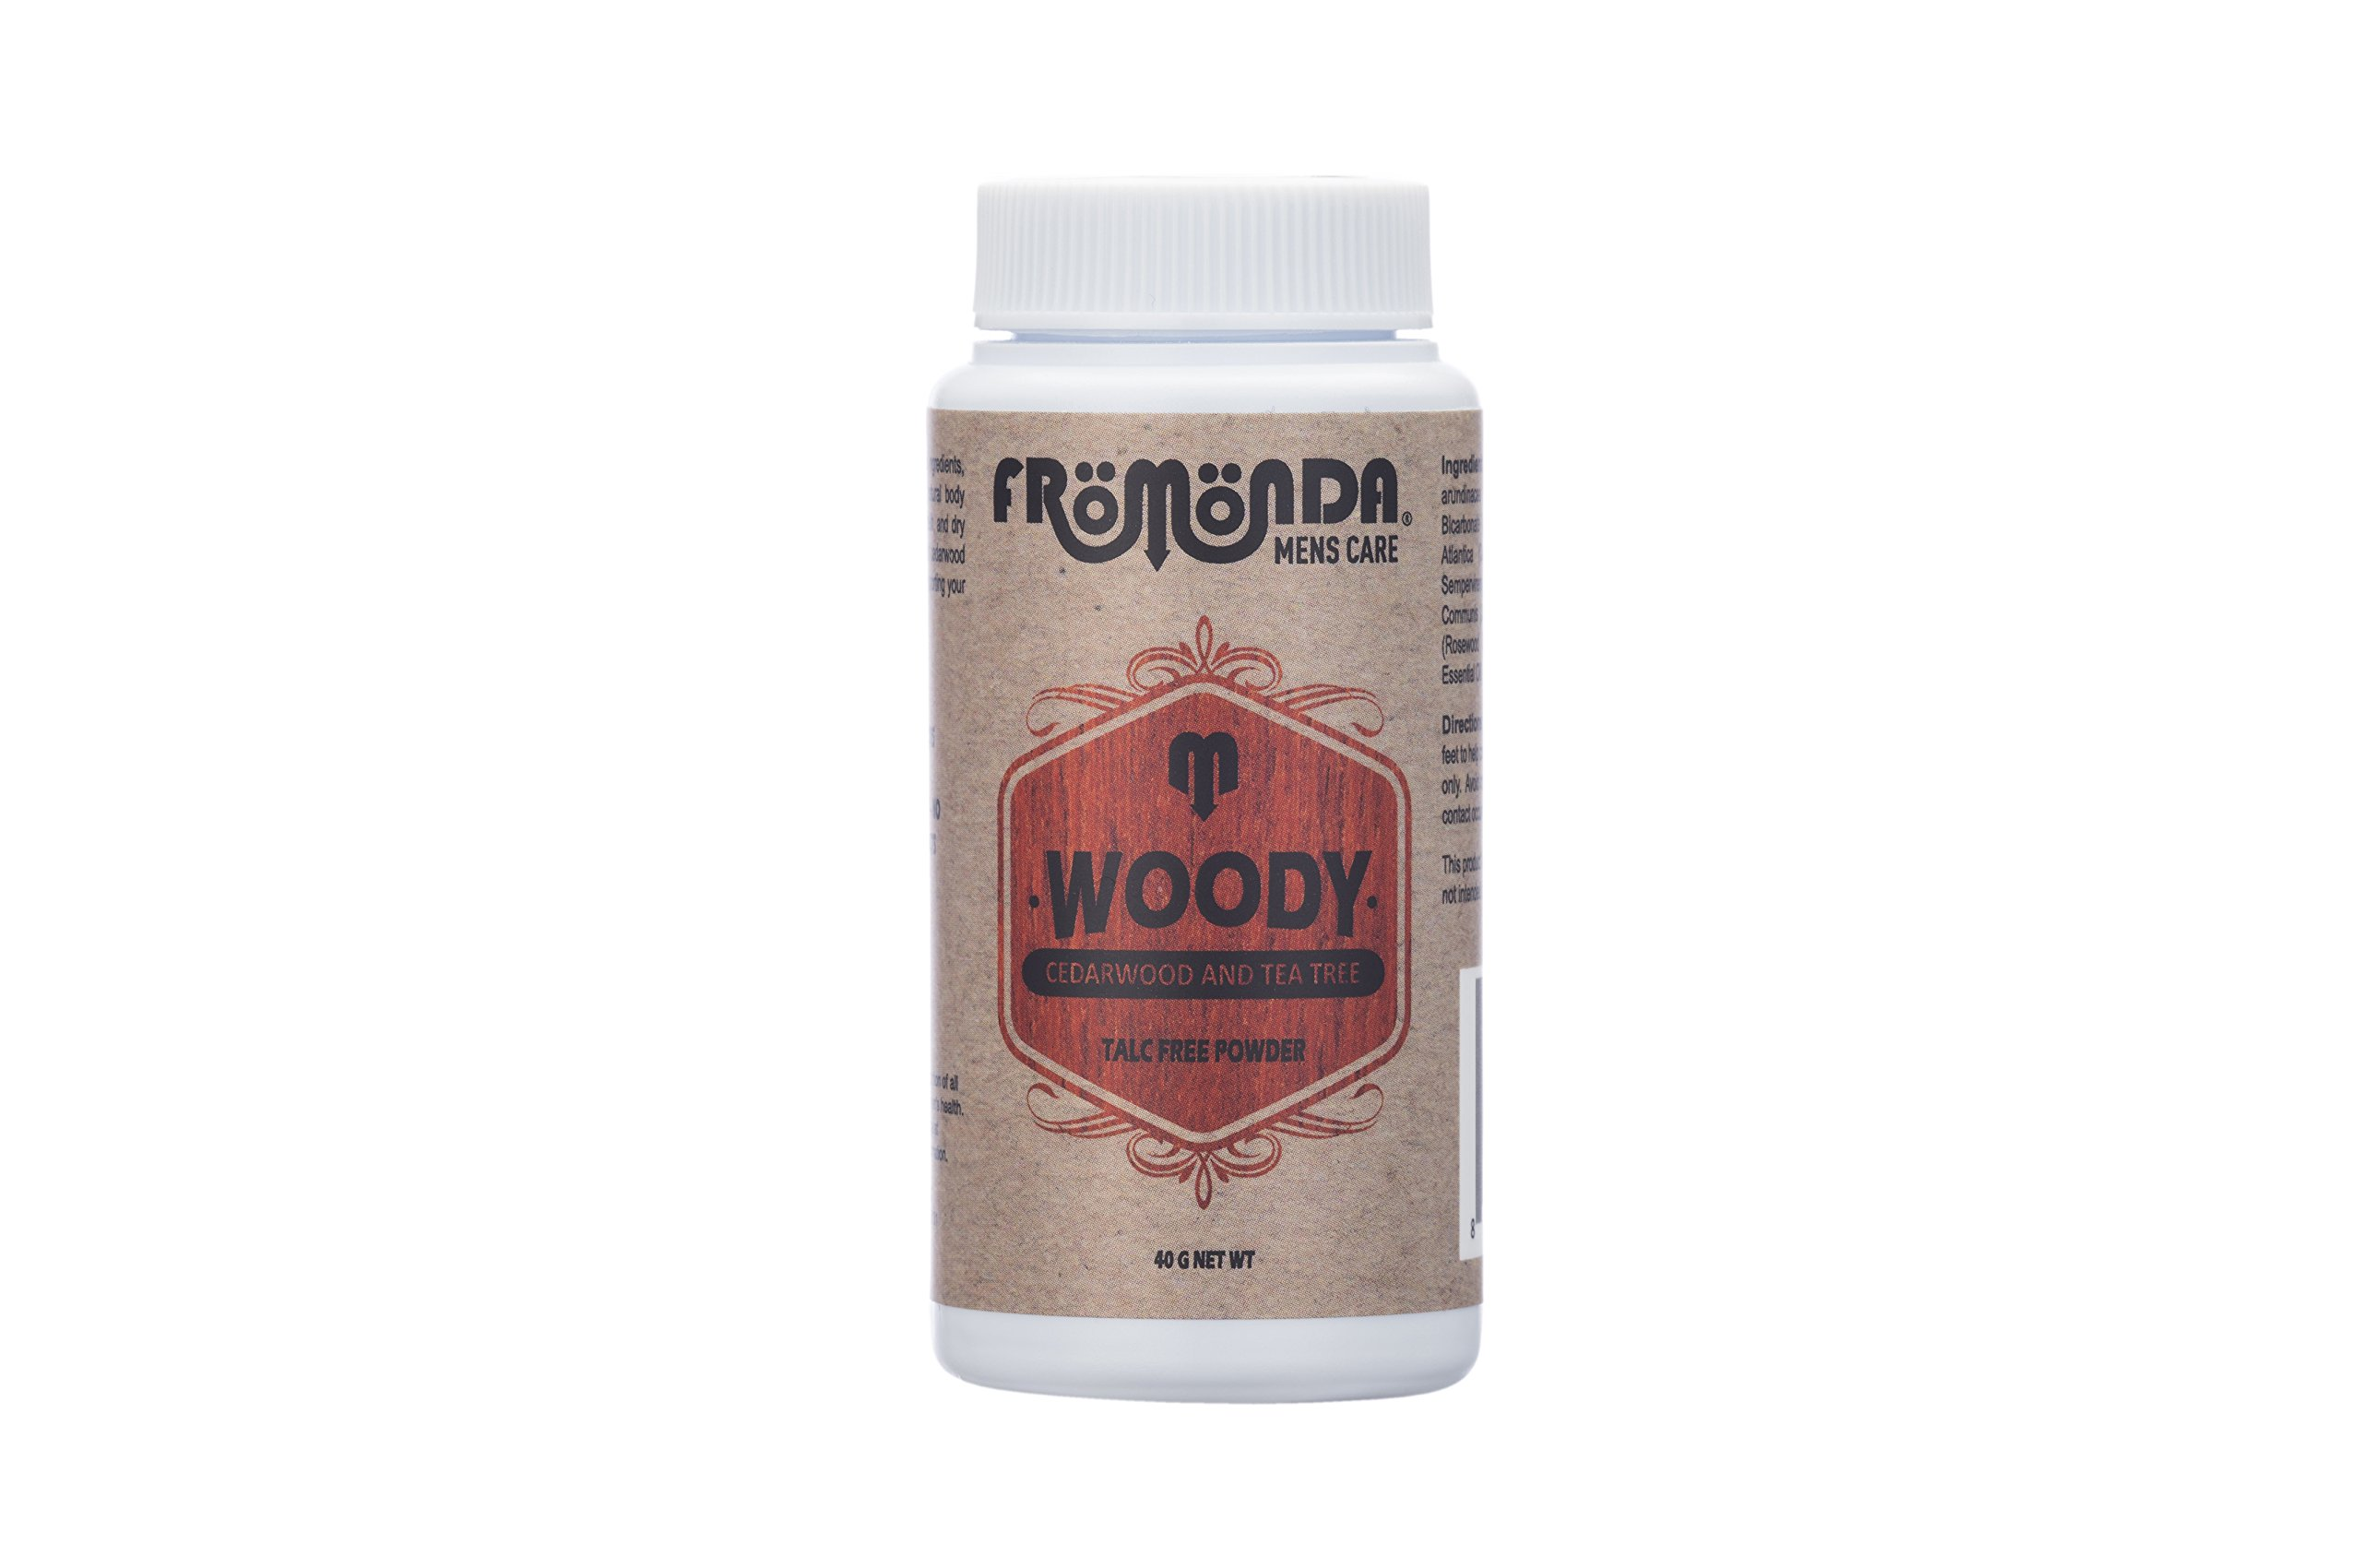 Fromonda Woody Talc Free Body Powder - Natural Dry Deodorant Made With Essential Oils For Men & Women – Athletic Dusting Powder – Vegan - 1.4 OZ